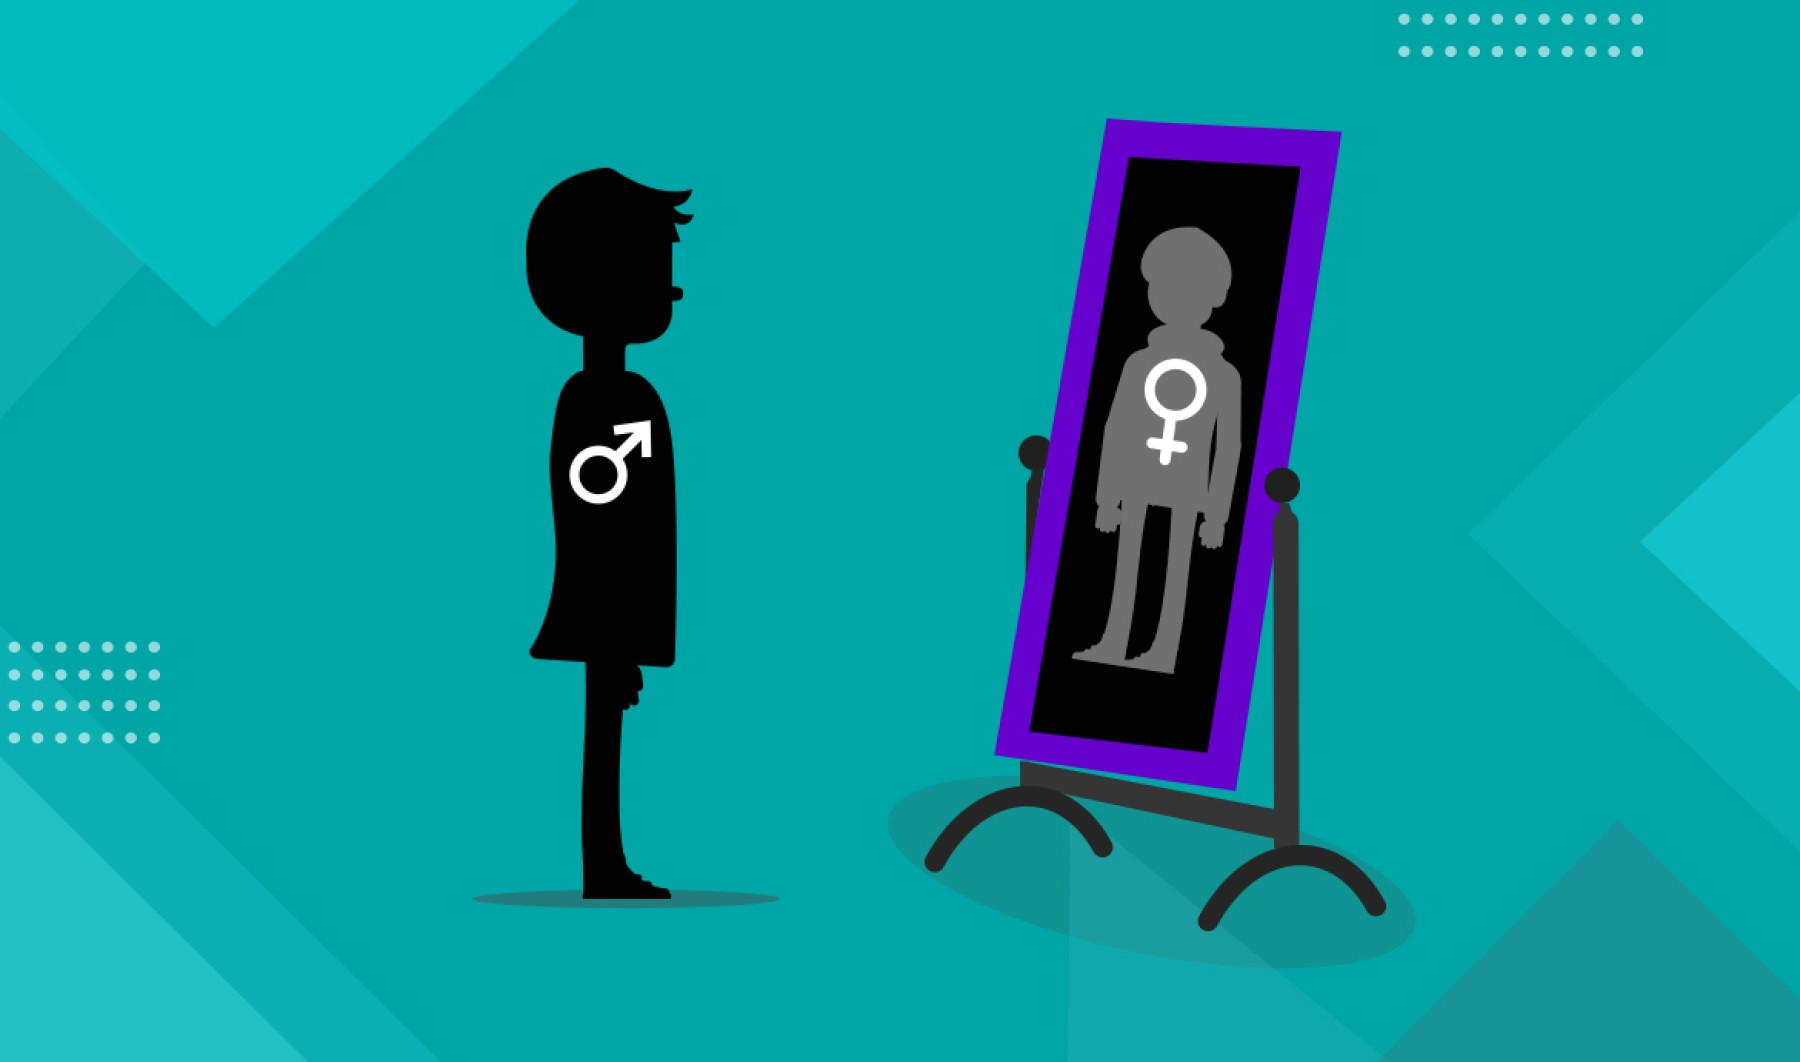 Gobierno CDMX infancias trans